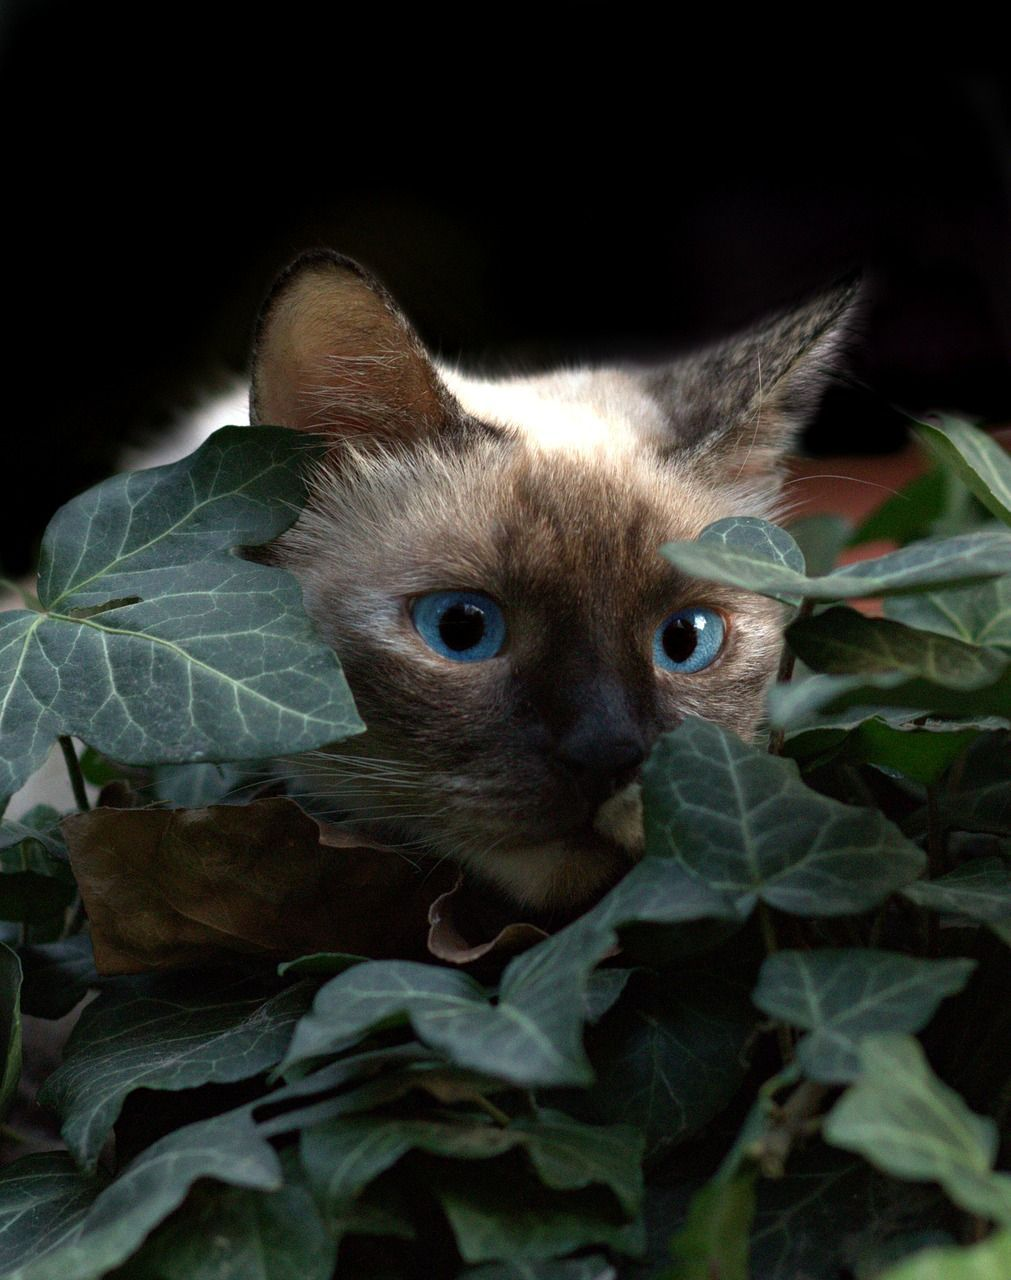 cat-2764899_1280.jpg